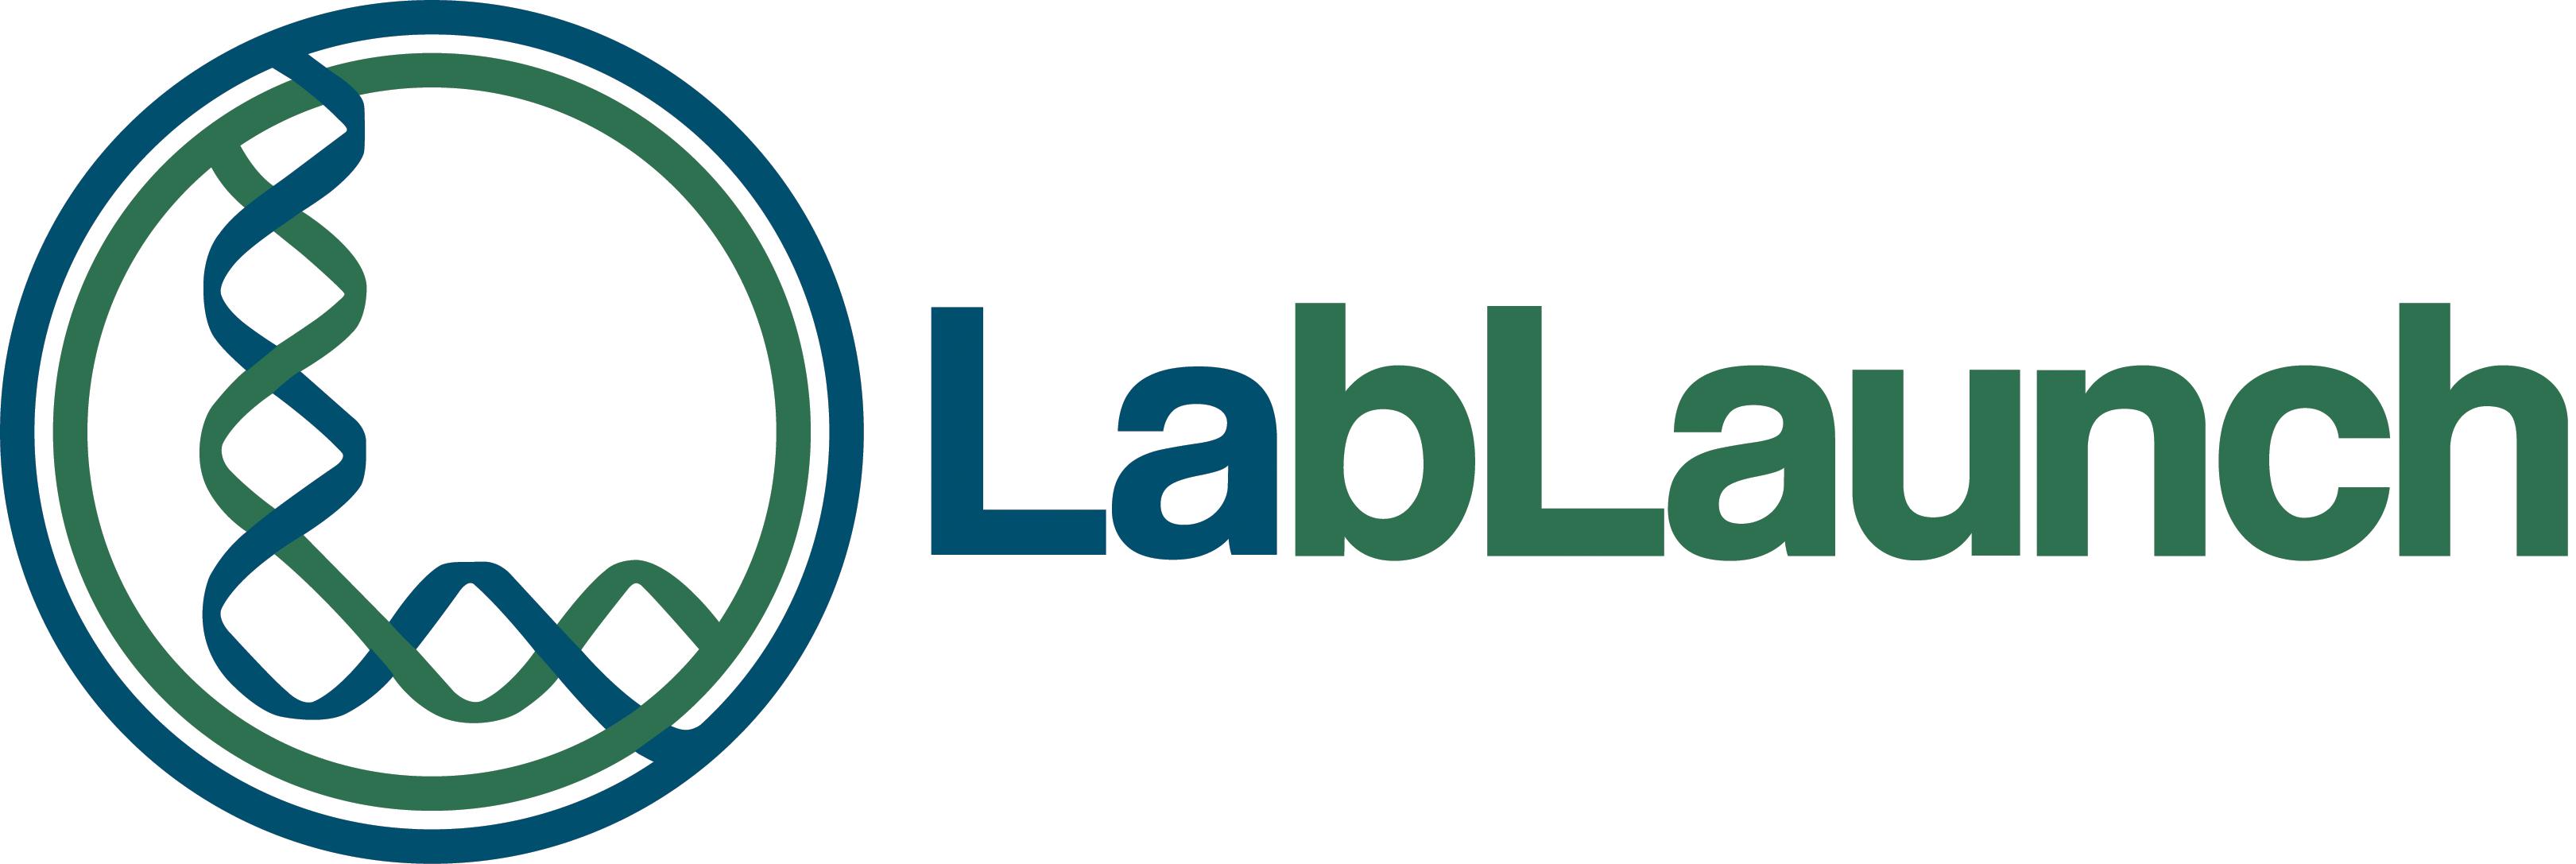 LabLaunch_new